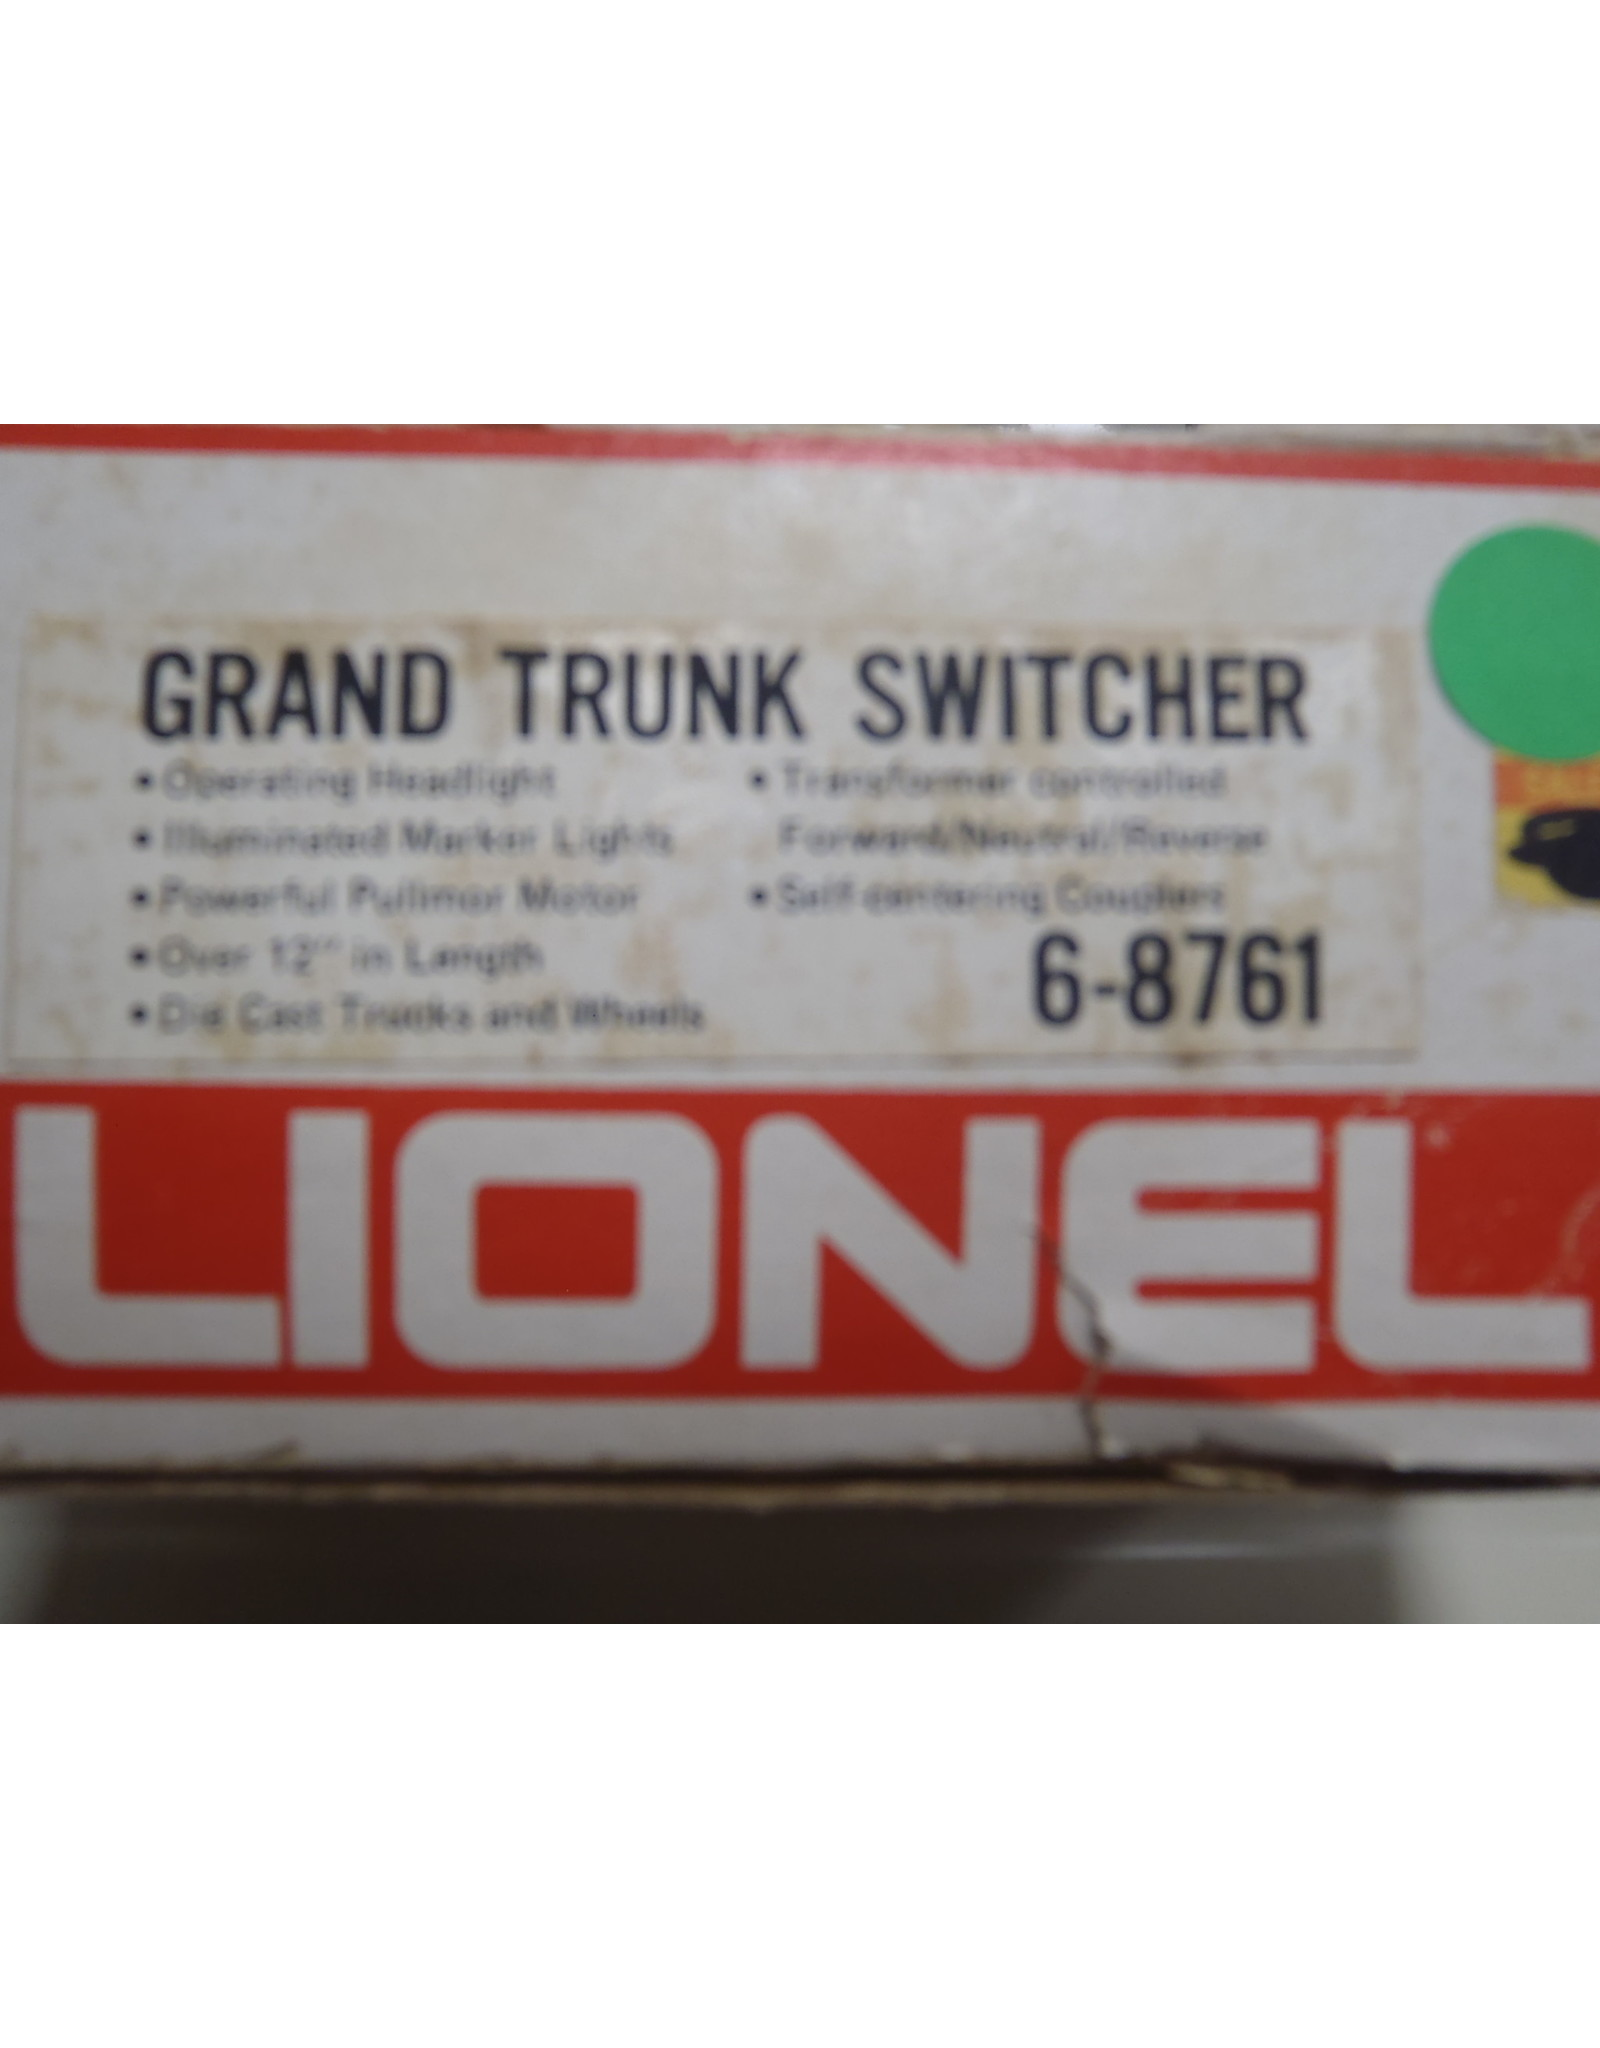 Lionel Lionel  Grand Trunk Switch 6-8761